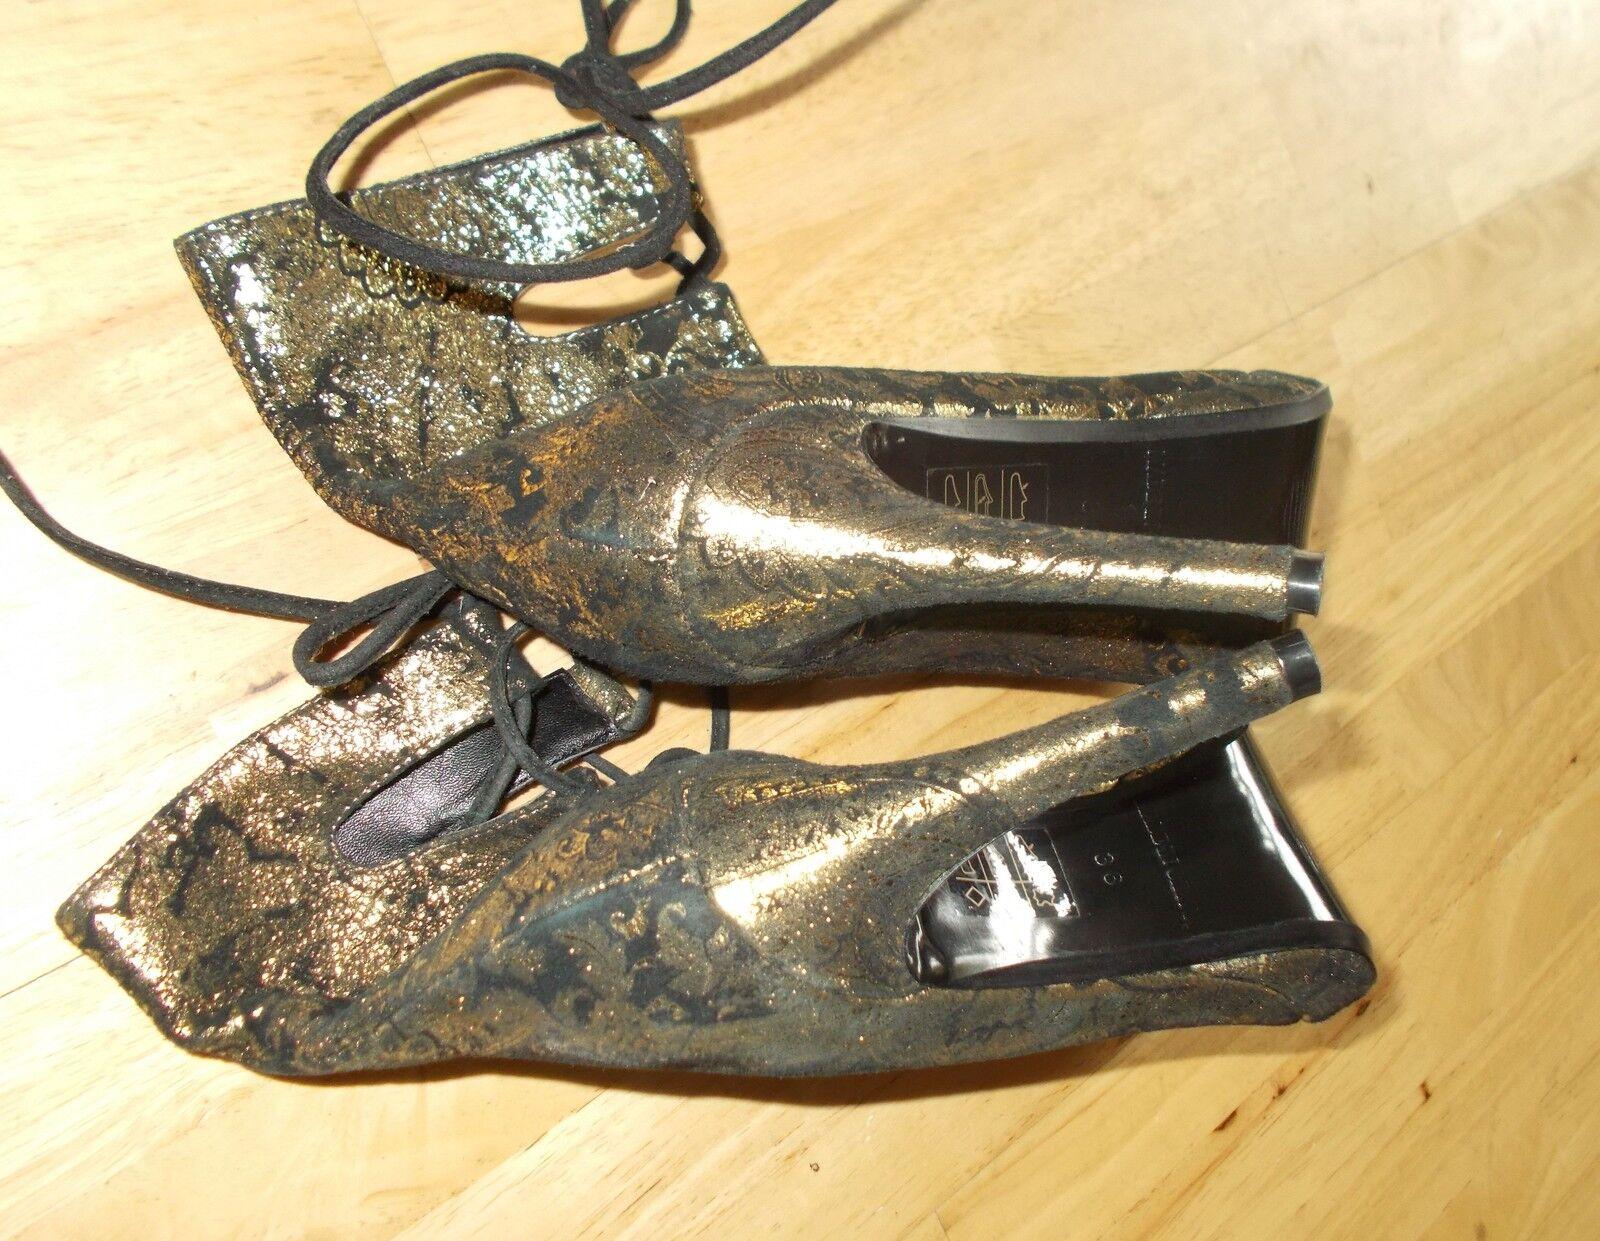 OFFICE schwarz Gold suede paisley floral lace-up STEAMPUNK STEAMPUNK STEAMPUNK schuhe Stiefel BNIB 3 36 0f17e0